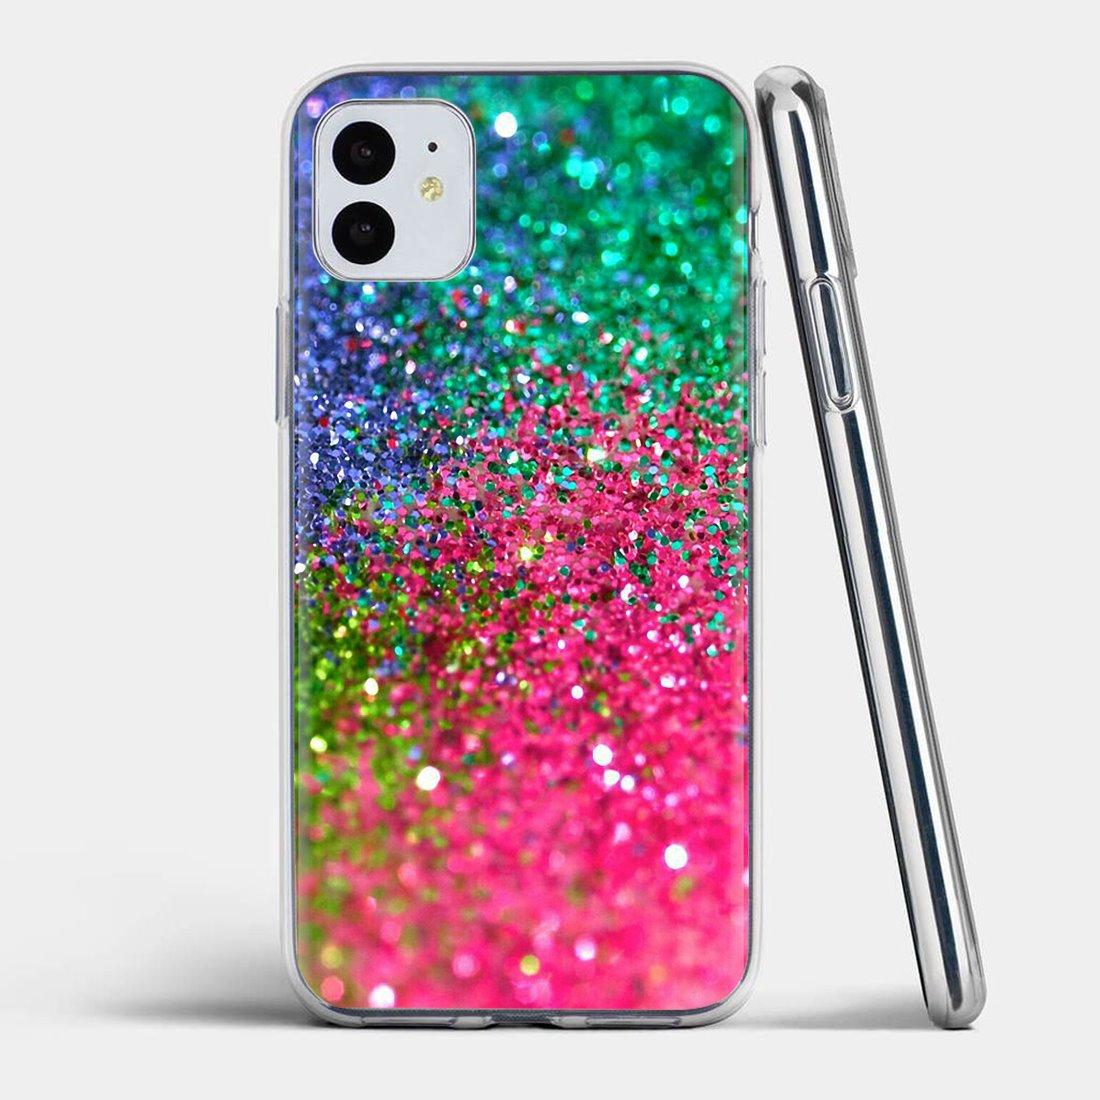 For ZTE Blade A910 A610 A530 A510 For Oneplus One plus 3T 5T 6T 6 7 7T Pro Soft TPU Case Sparkle Glitter diamond crystal